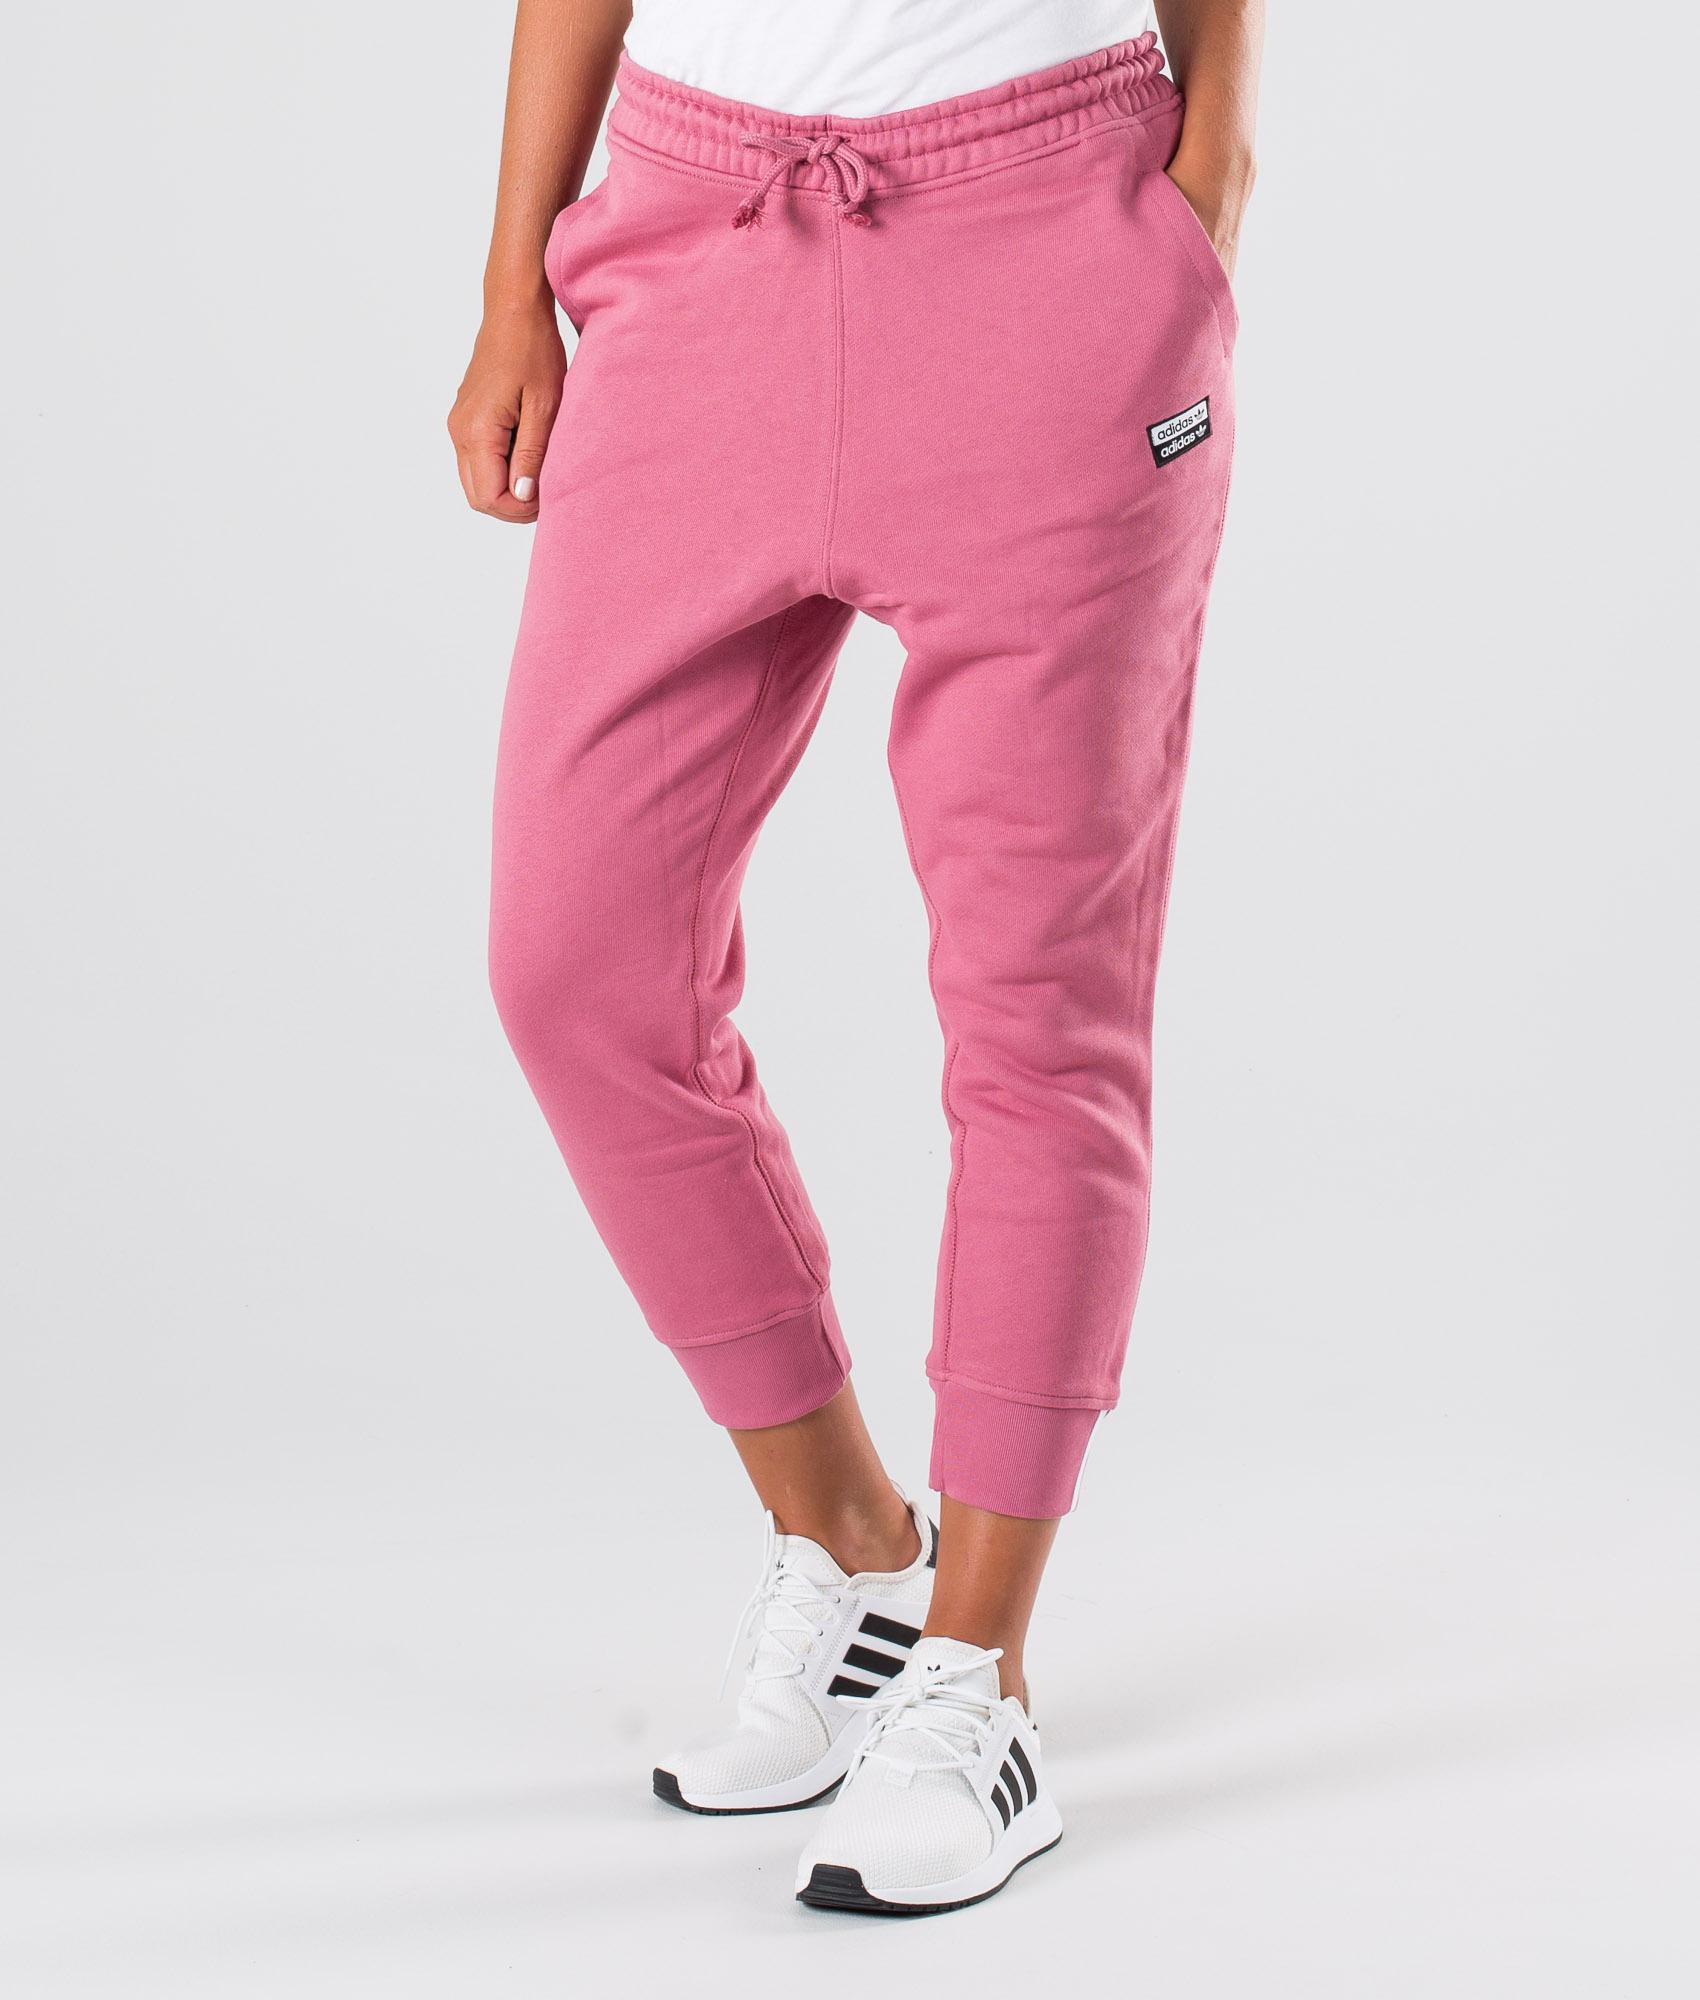 Adidas Originals Pant Hosen Trace Maroon